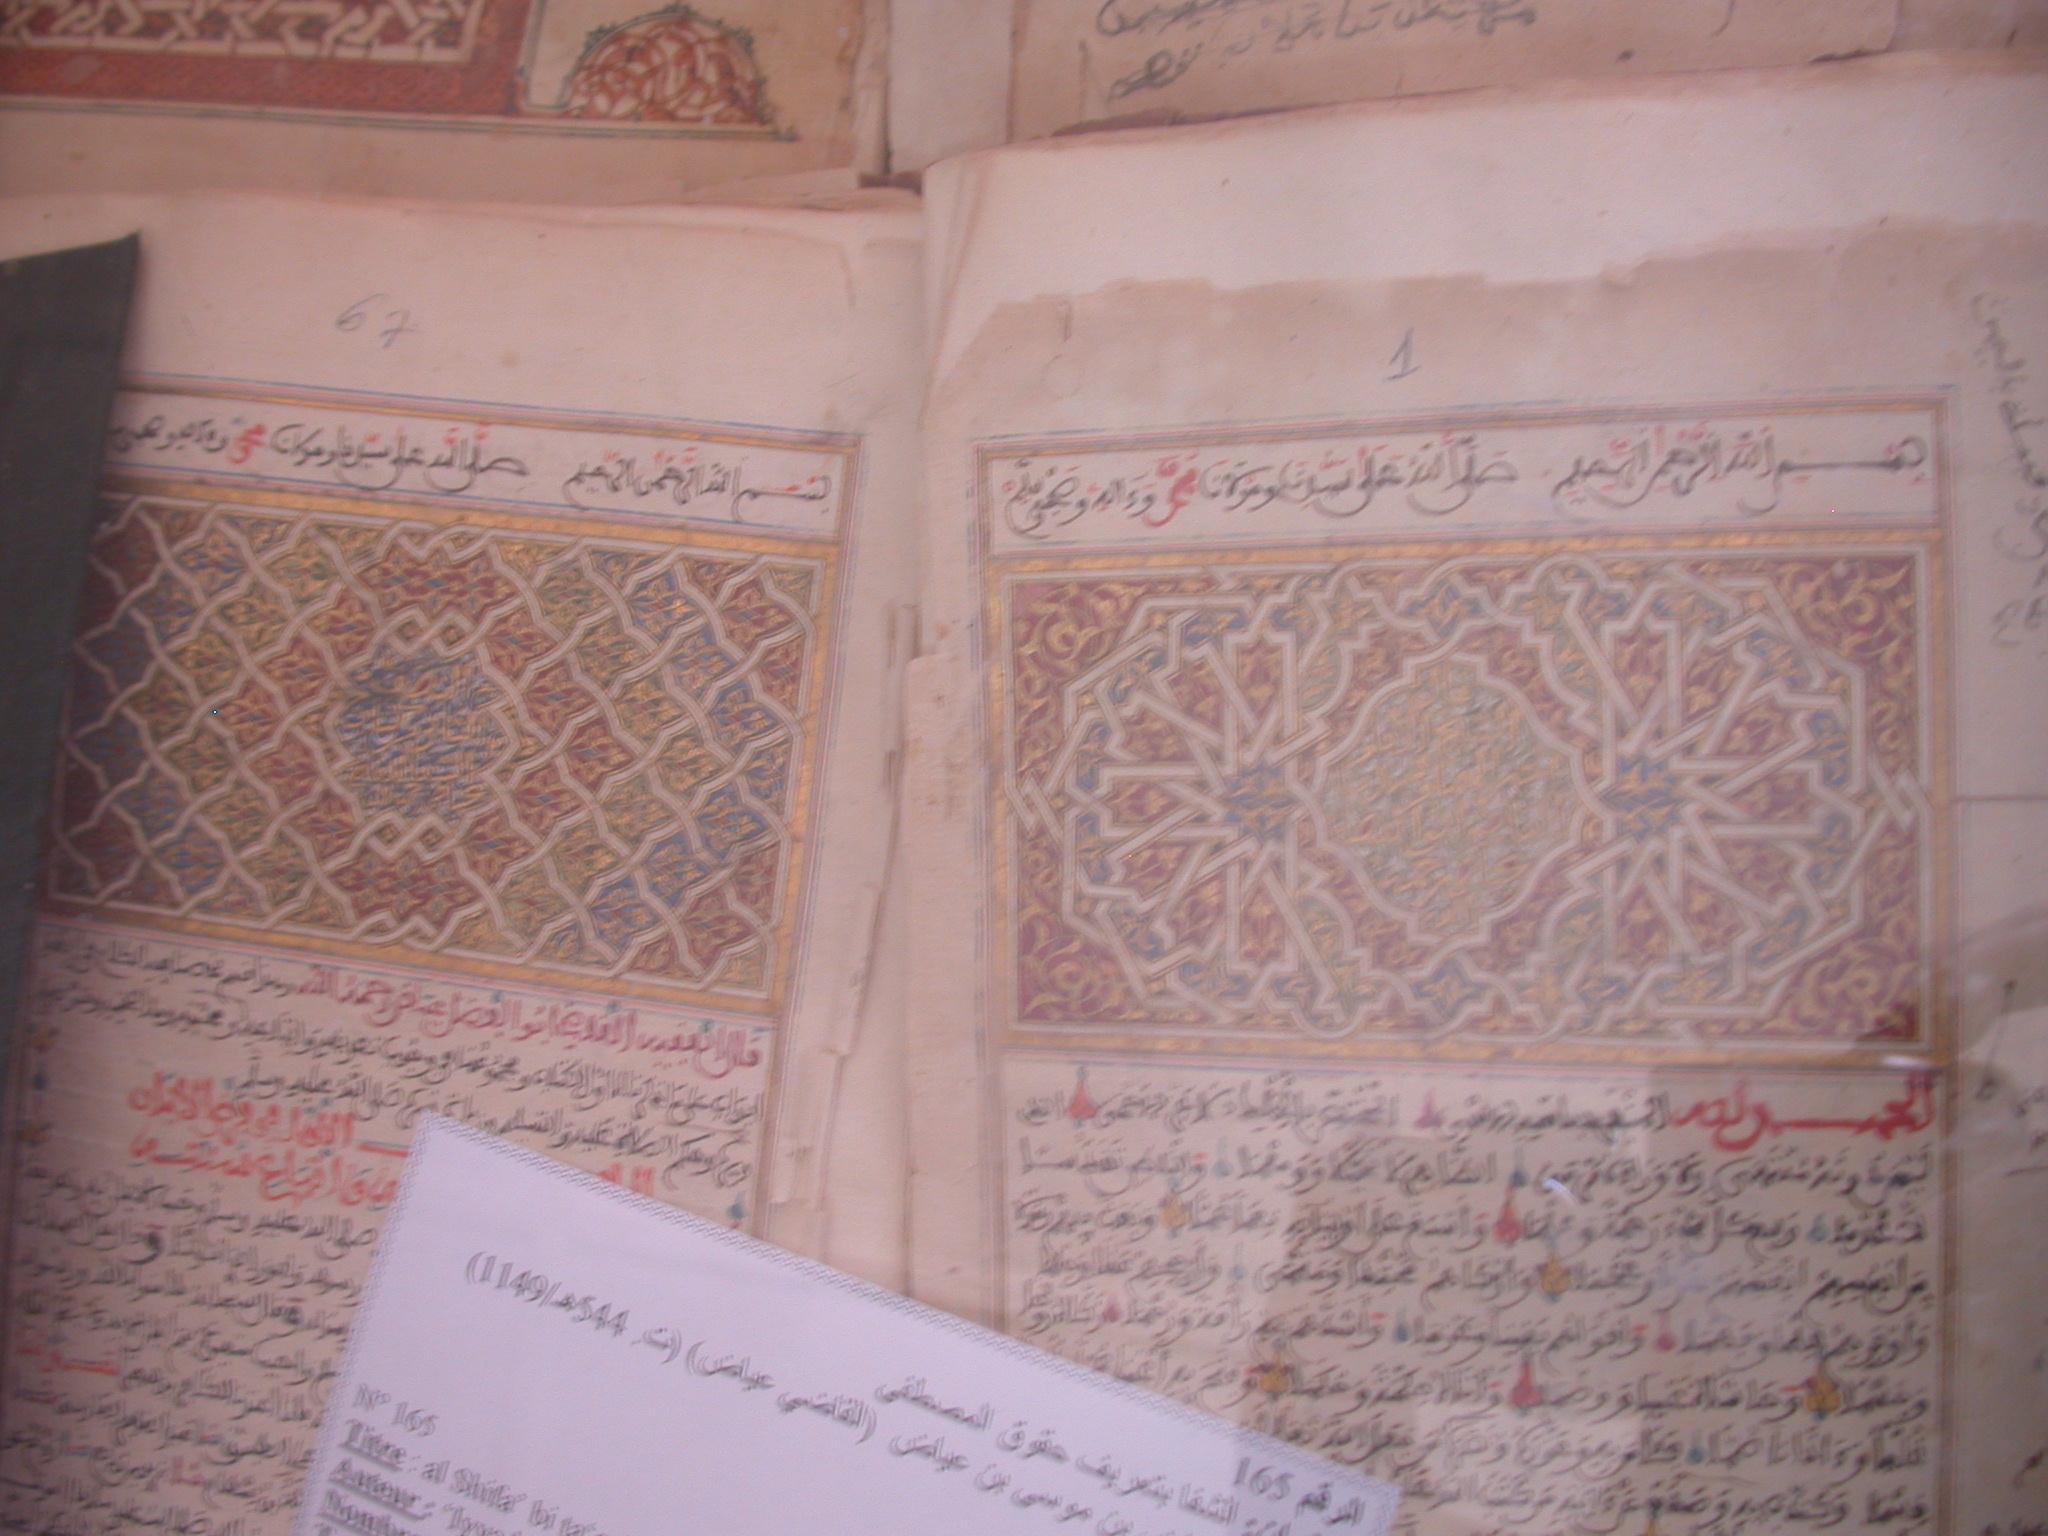 Photo of Manuscript, Al Shifa bi ta arif huquq al Mustafa, Illumination Detail, Ahmed Baba Institute, Institut des Hautes Etudes et de Recherches Islamiques, Timbuktu, Mali